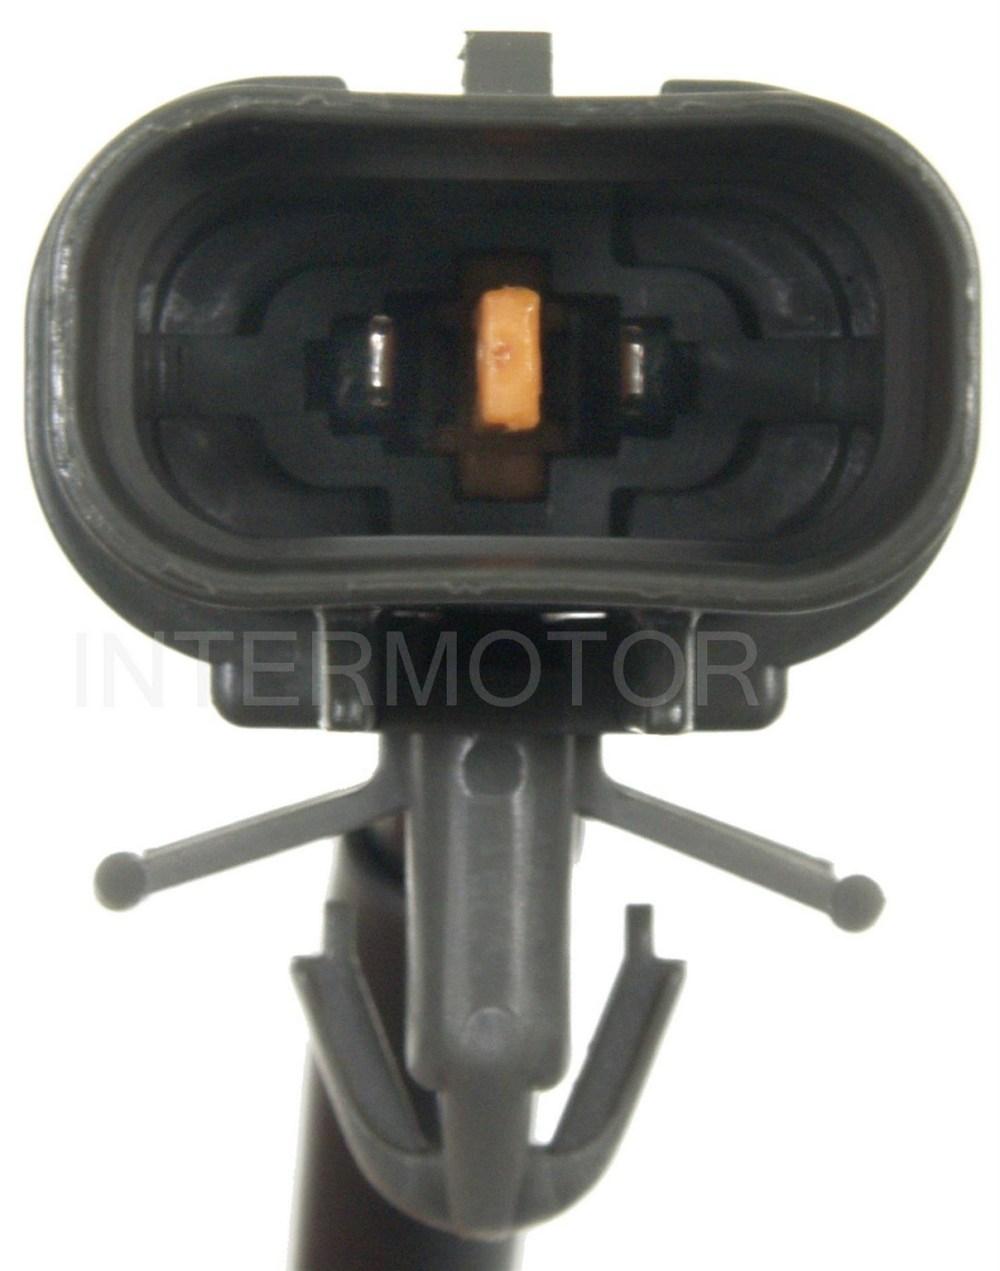 medium resolution of  2003 mitsubishi eclipse abs wheel speed sensor si als1198